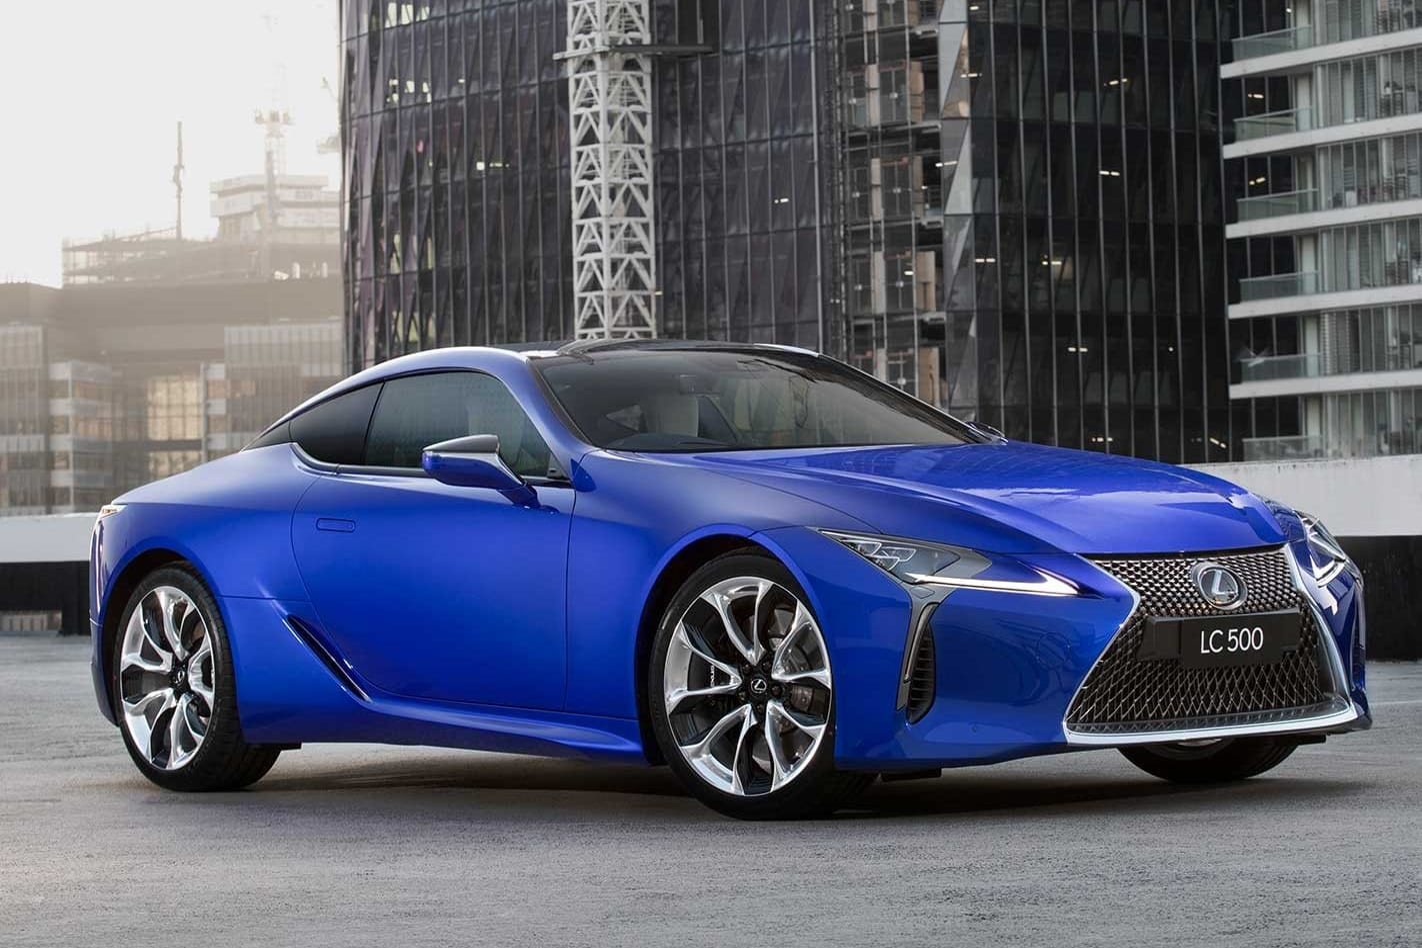 Lexus Morphic Blue Paint 15 Years Of Research Jpg